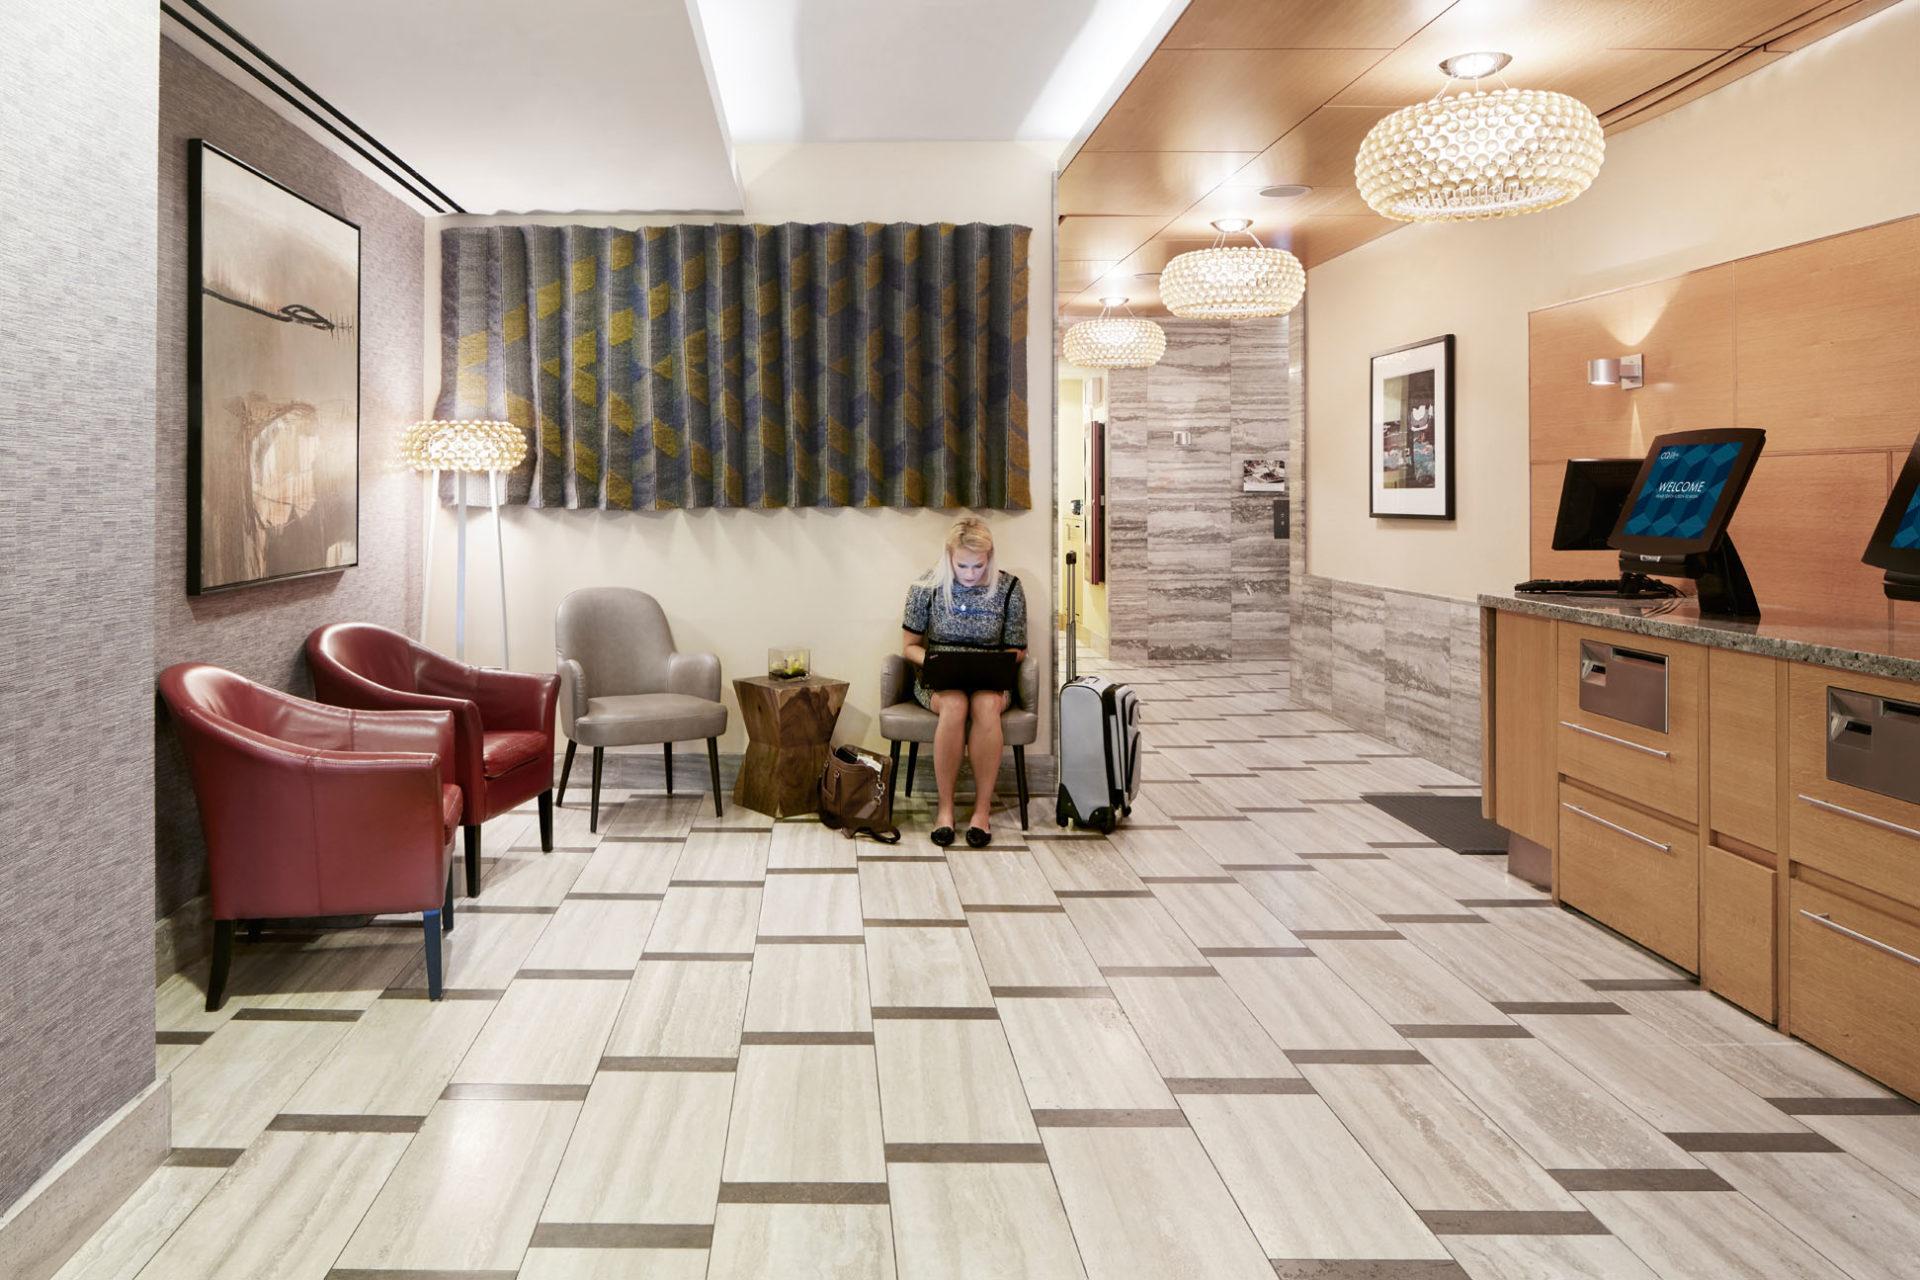 https://www.hotelsbyday.com/_data/default-hotel_image/1/7711/lobby-cq-jewel-3751-1920x1280.jpg